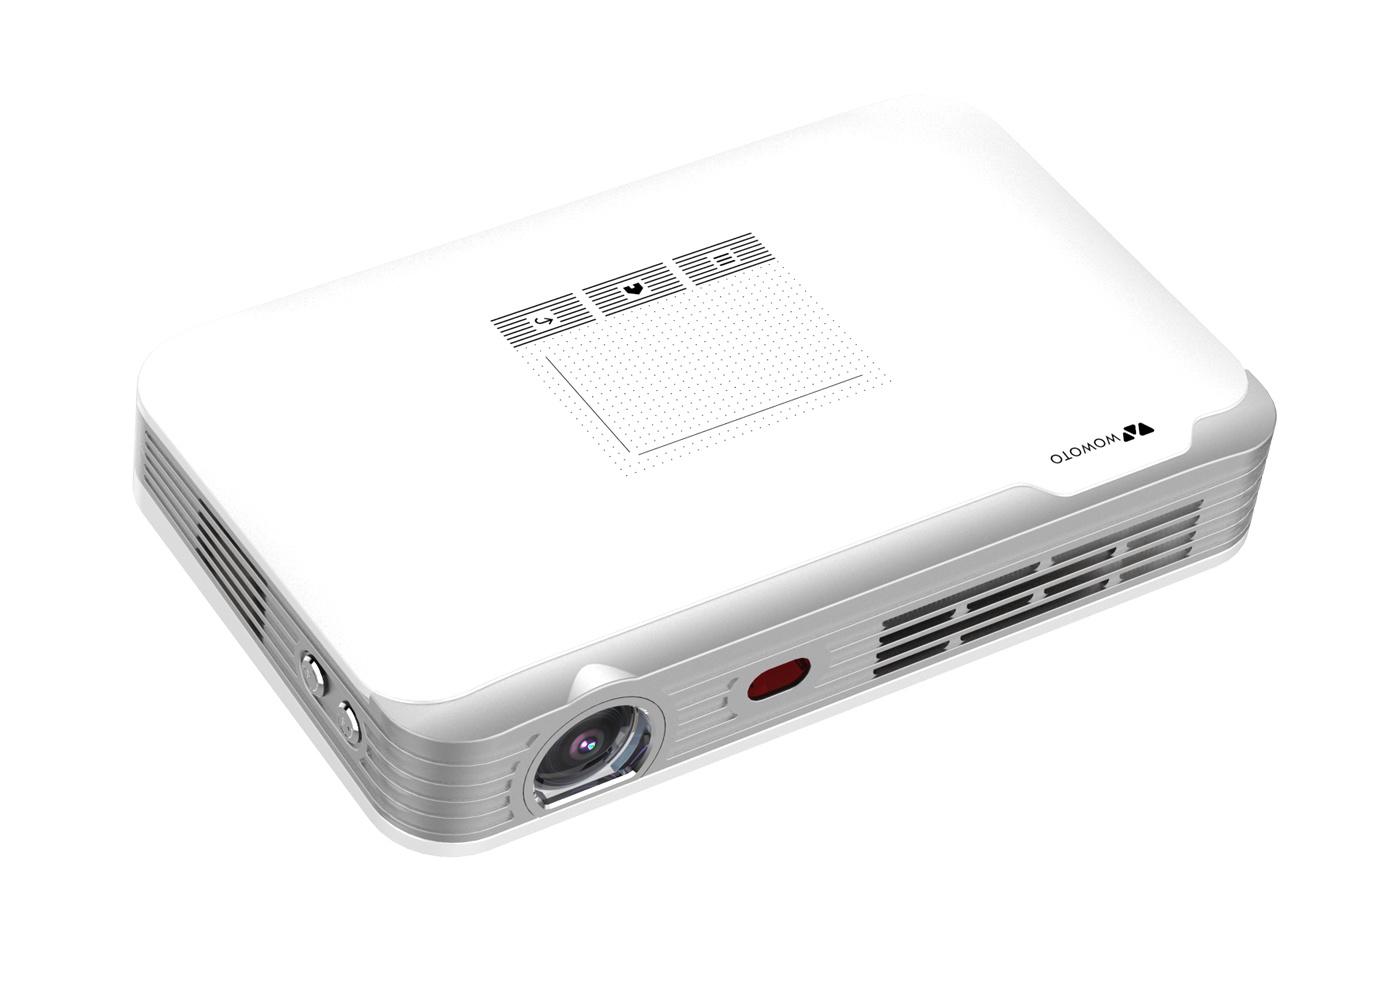 569d6f685bcb53 Hot Sale Newest Pico LED Projector 2500 Lumens Pocket Projector/Mini  Projector/1080P Projector (T8e)